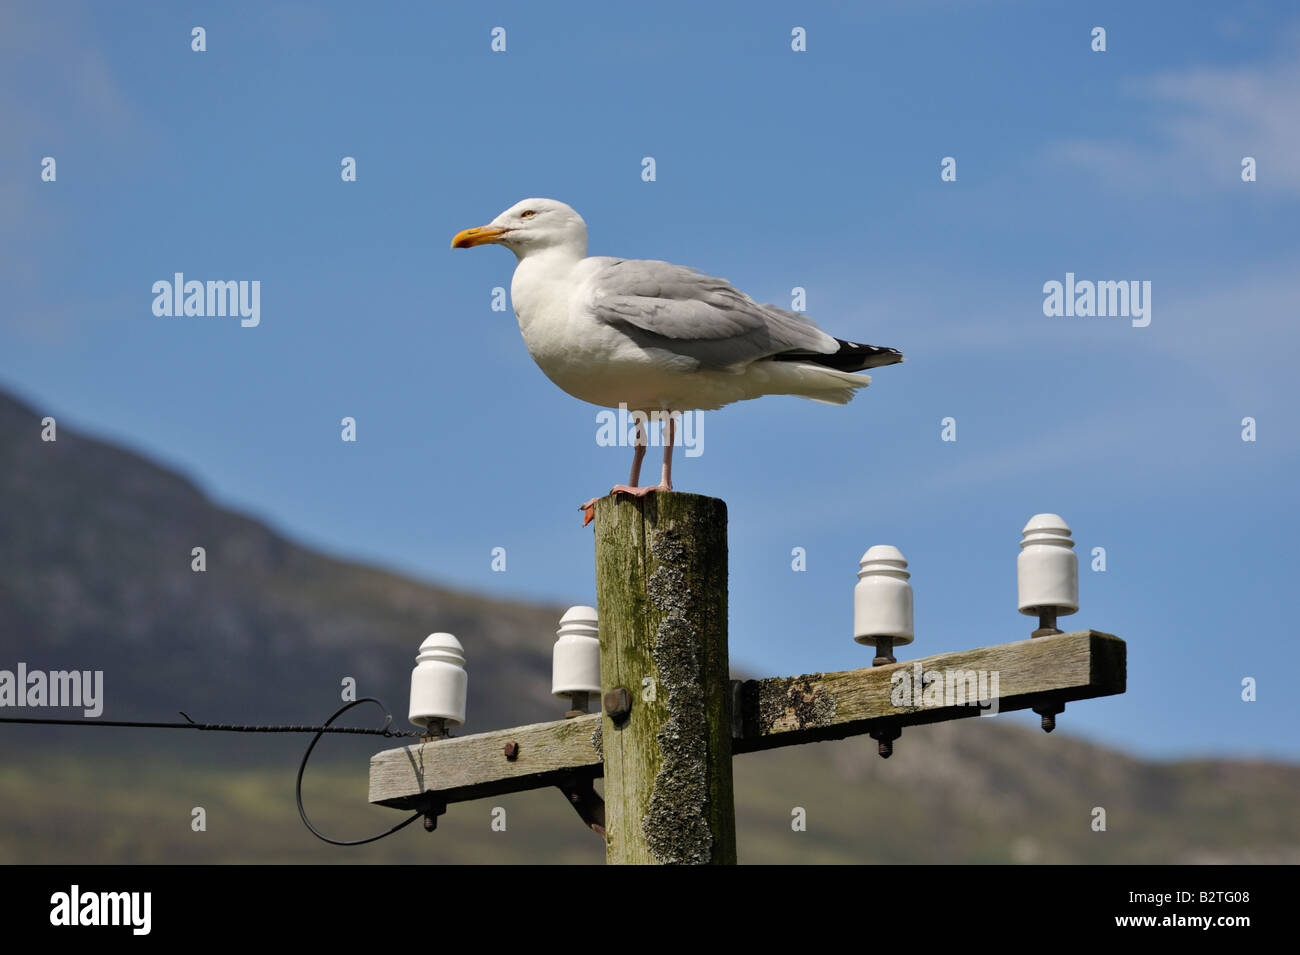 herring-gull-larus-argentatus-pontoppidan-perching-on-an-old-telegraph-B2TG08.jpg